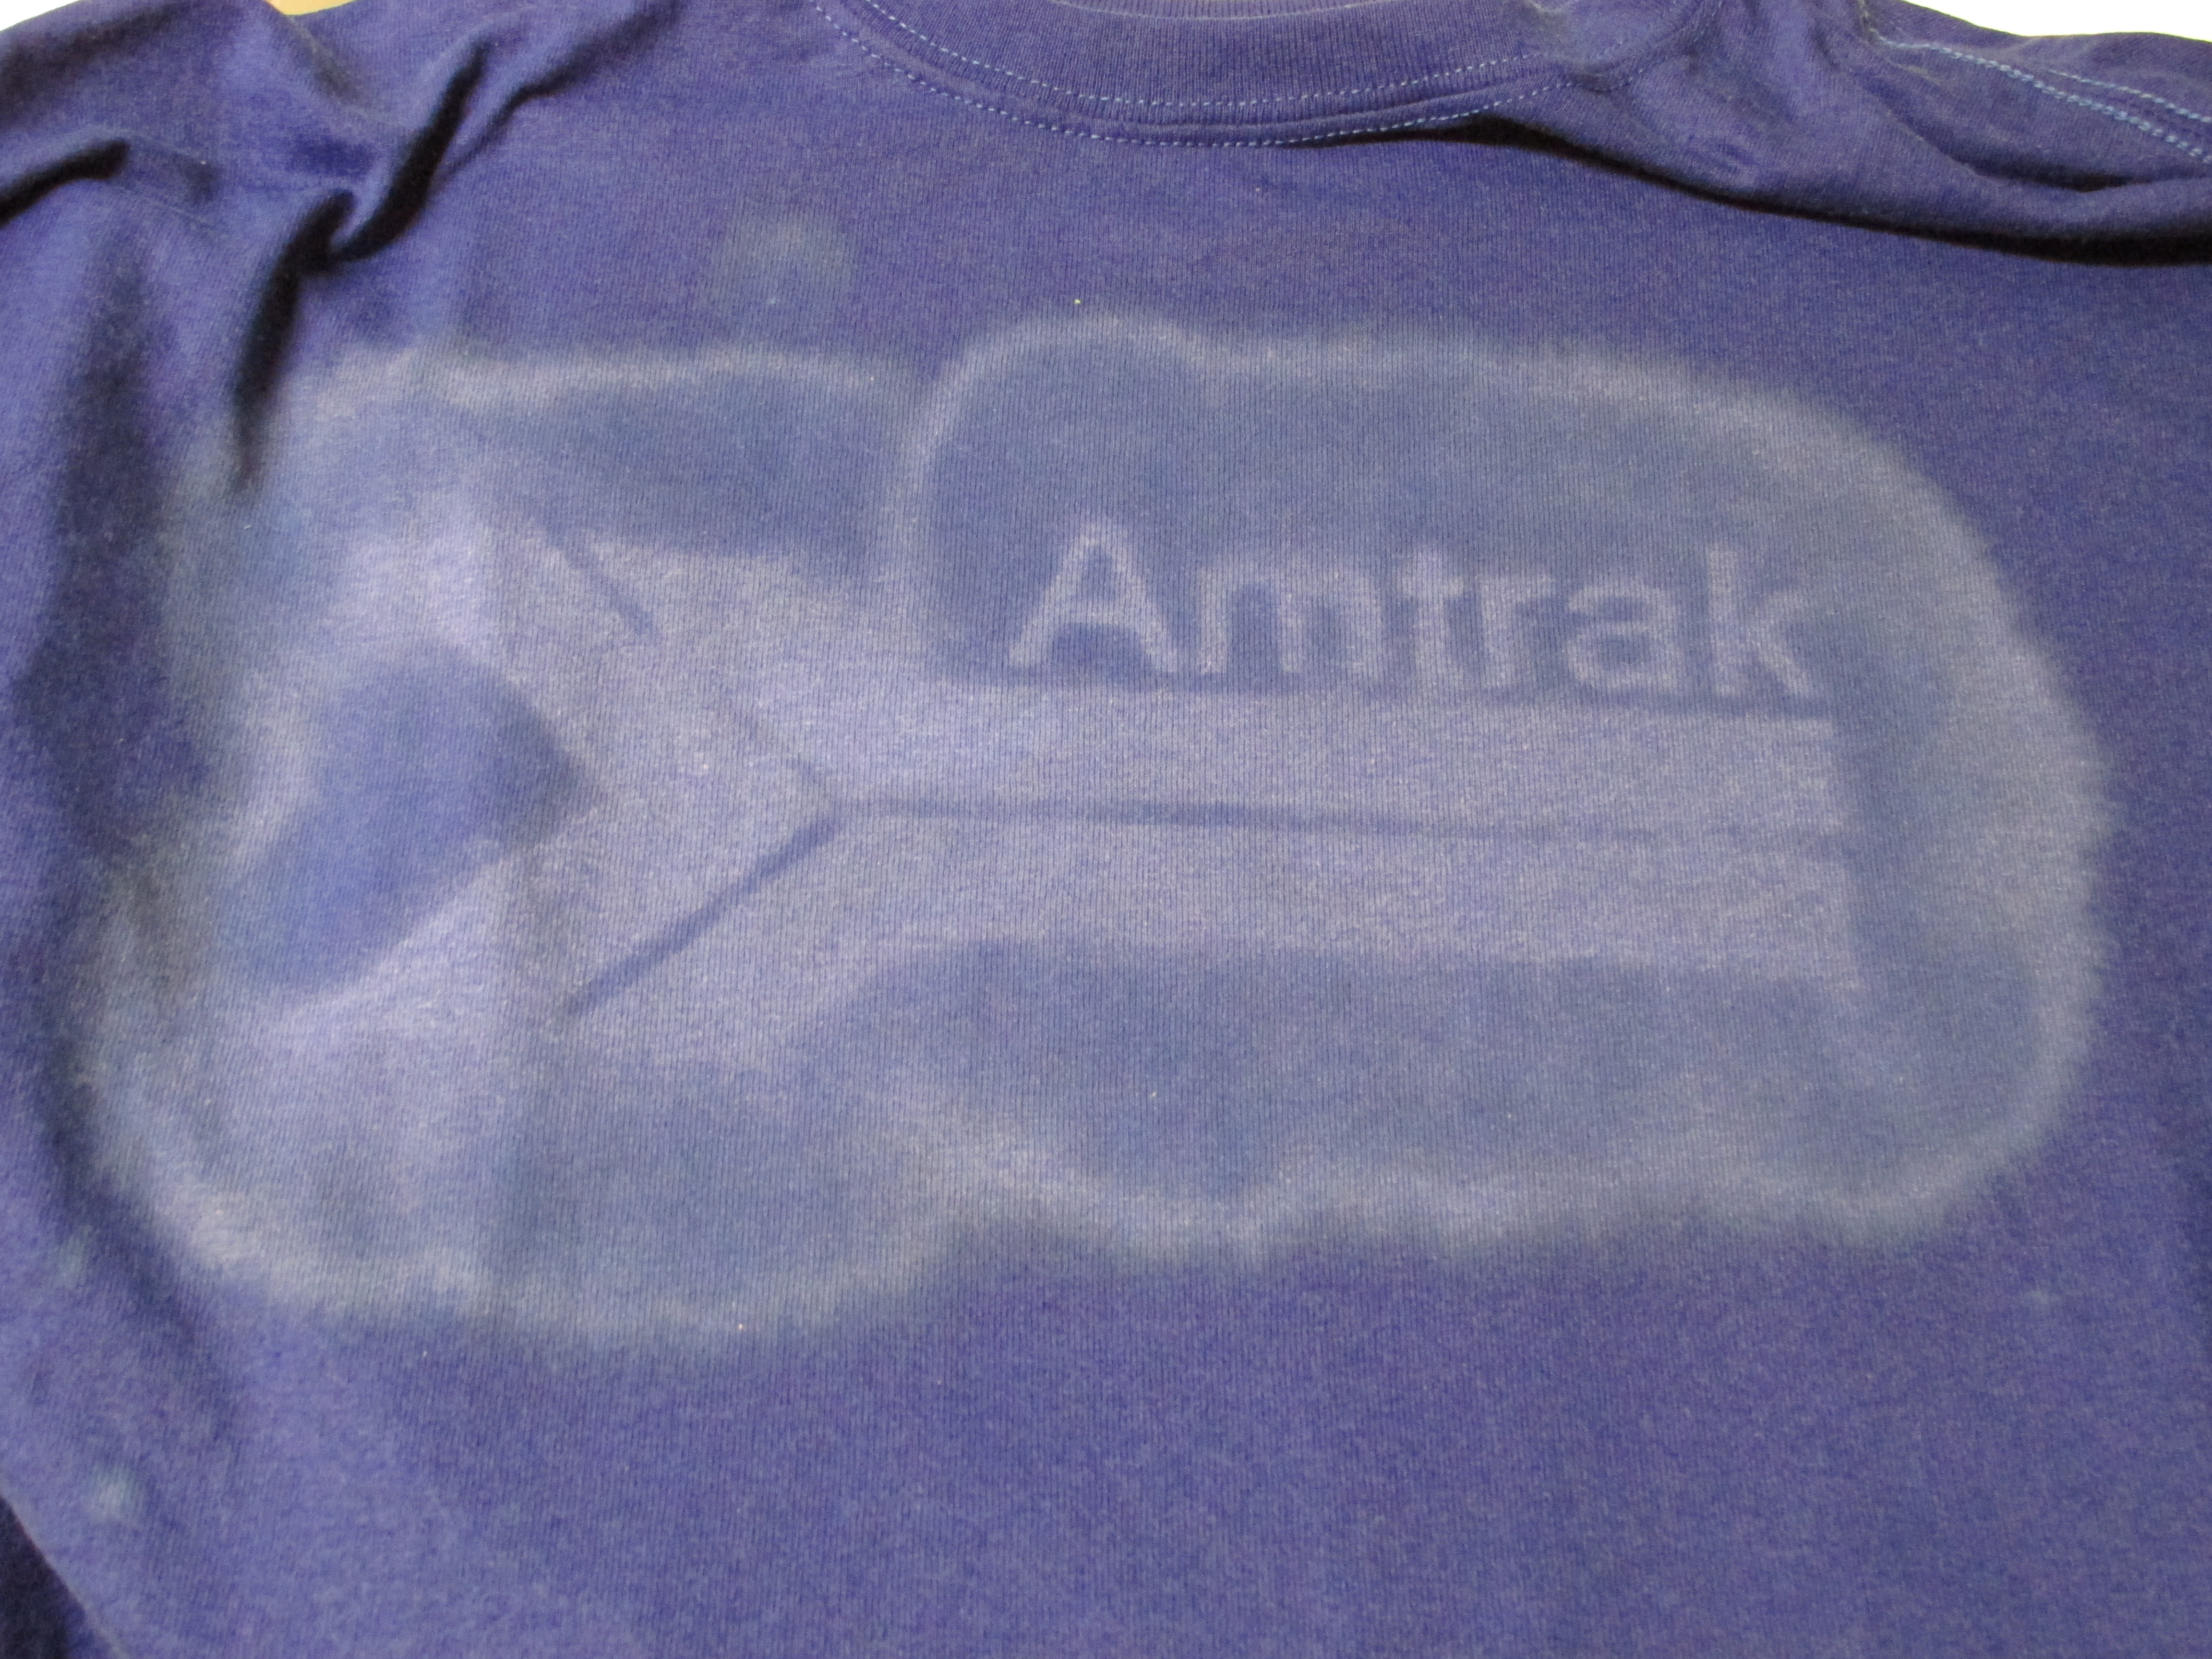 Shirt design using bleach - Img_2878